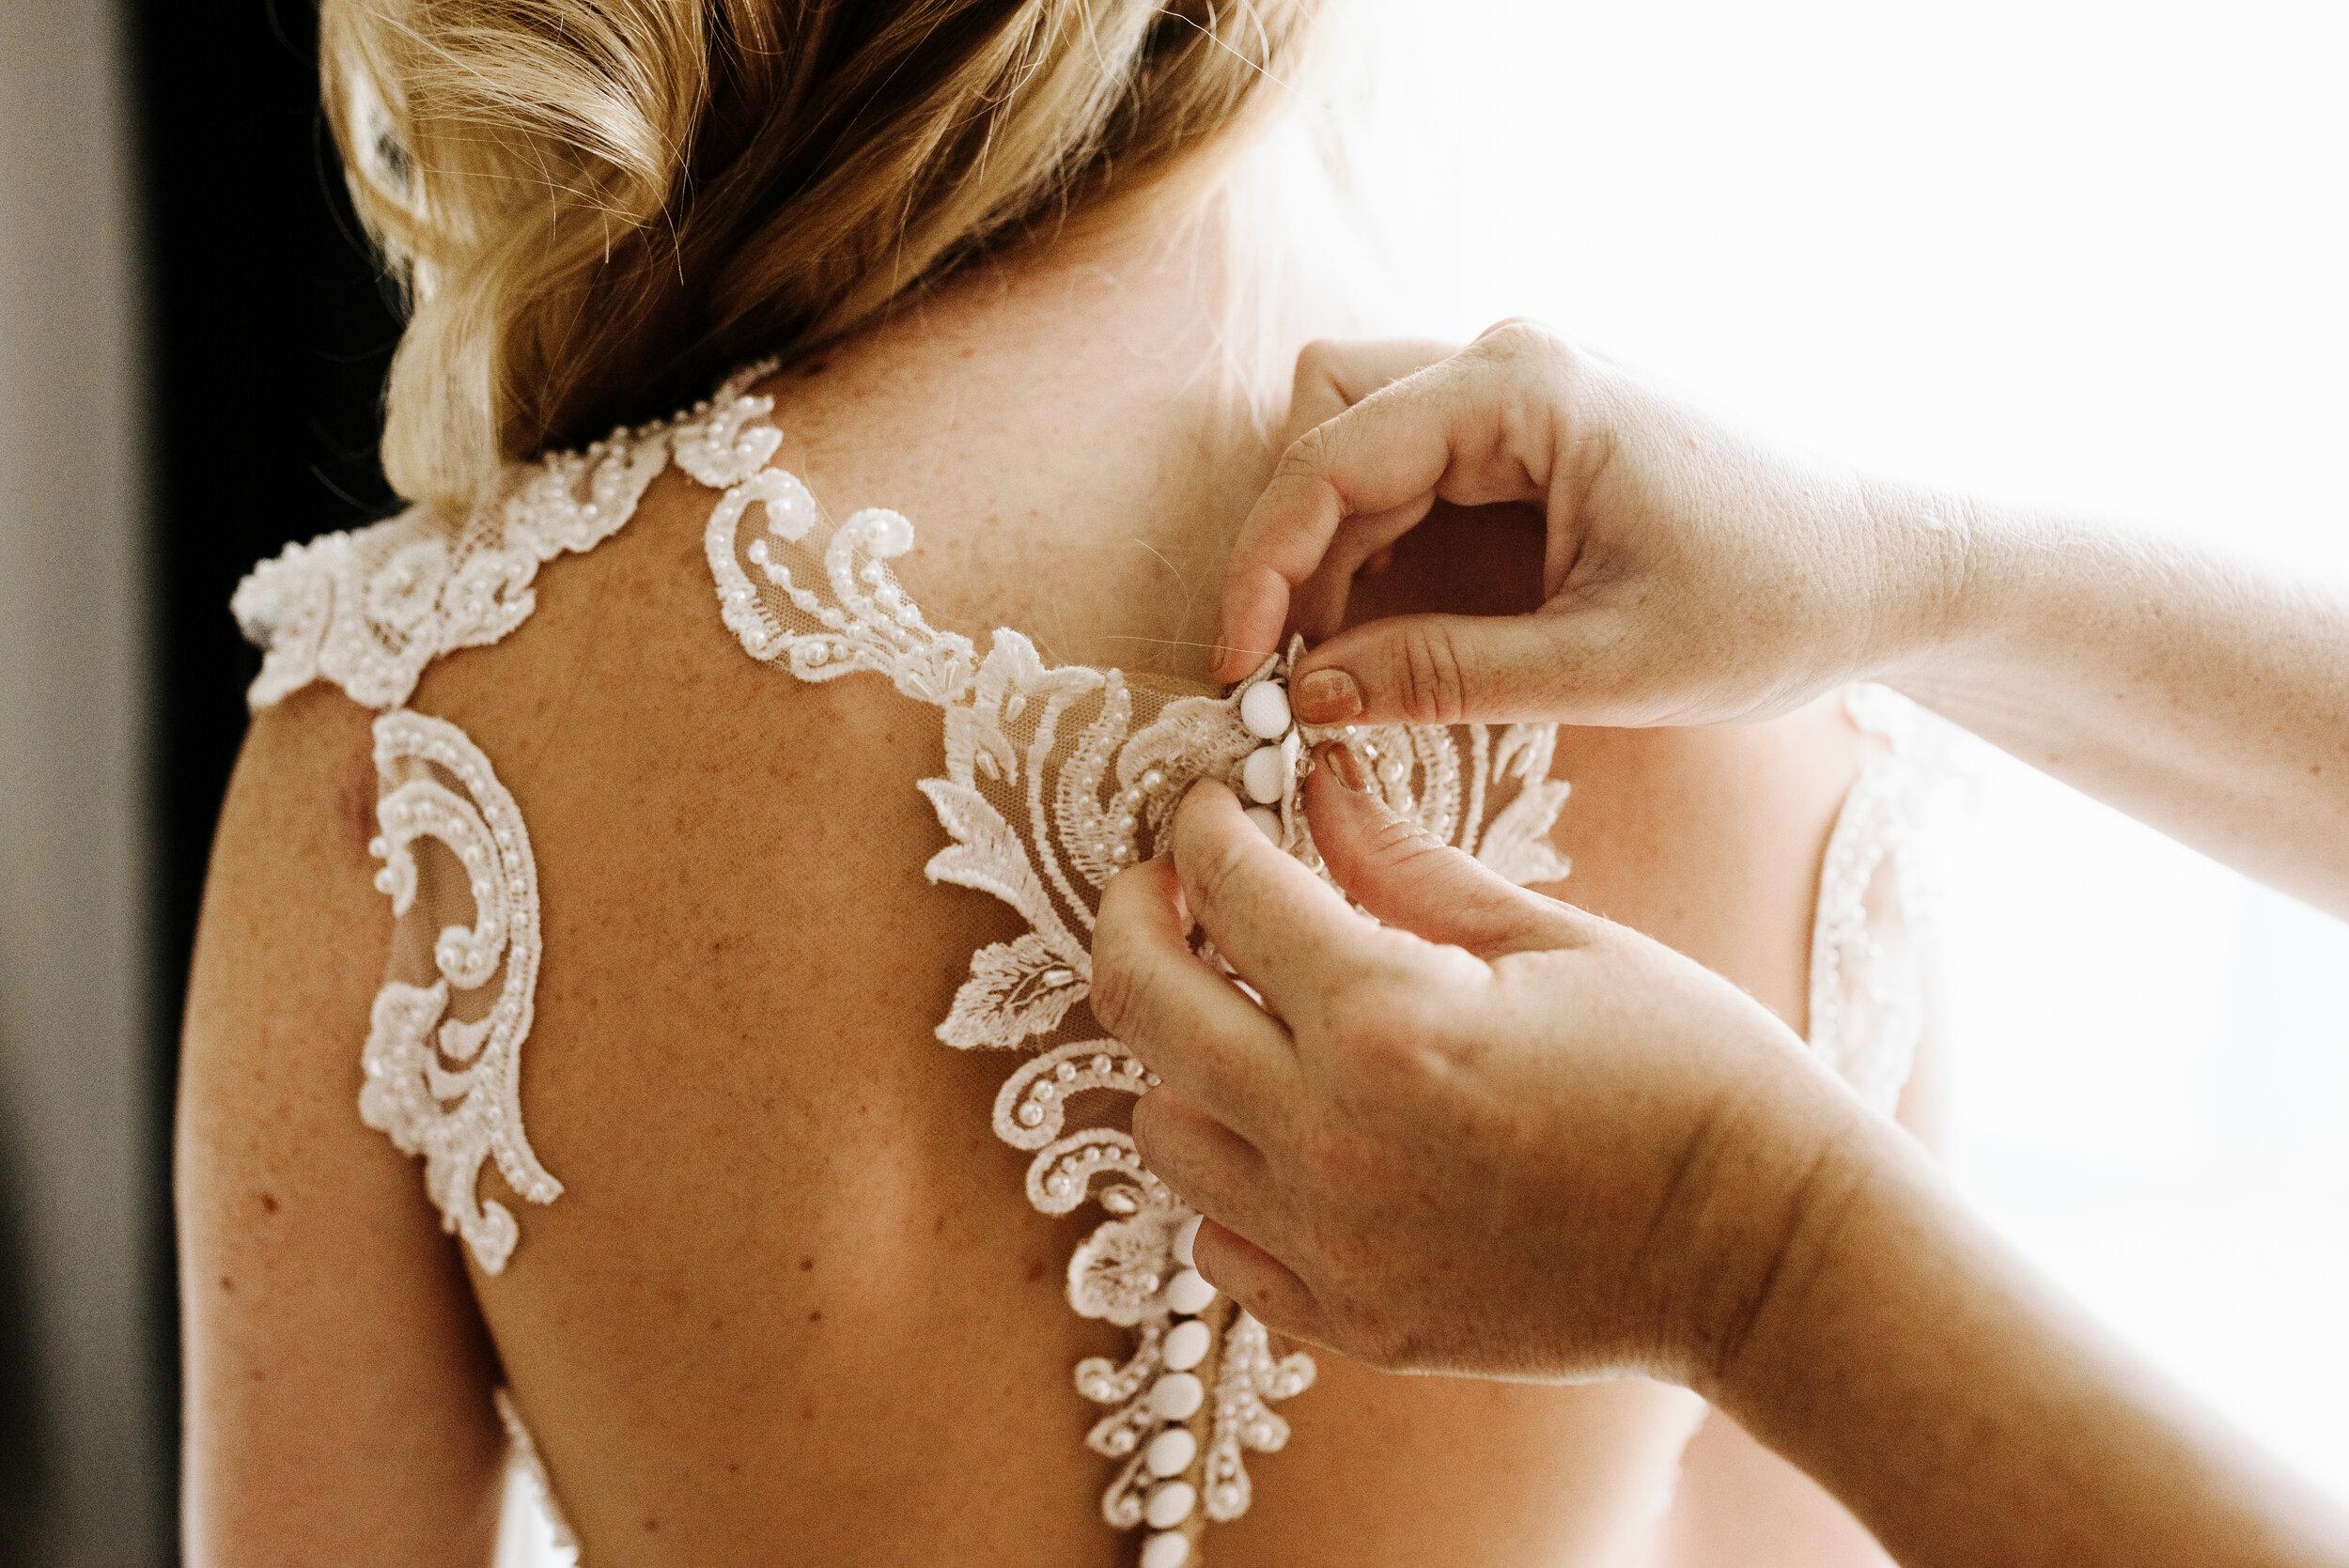 Cassie-Mrunal-Wedding-Quirk-Hotel-John-Marshall-Ballrooms-Richmond-Virginia-Photography-by-V-12.jpg